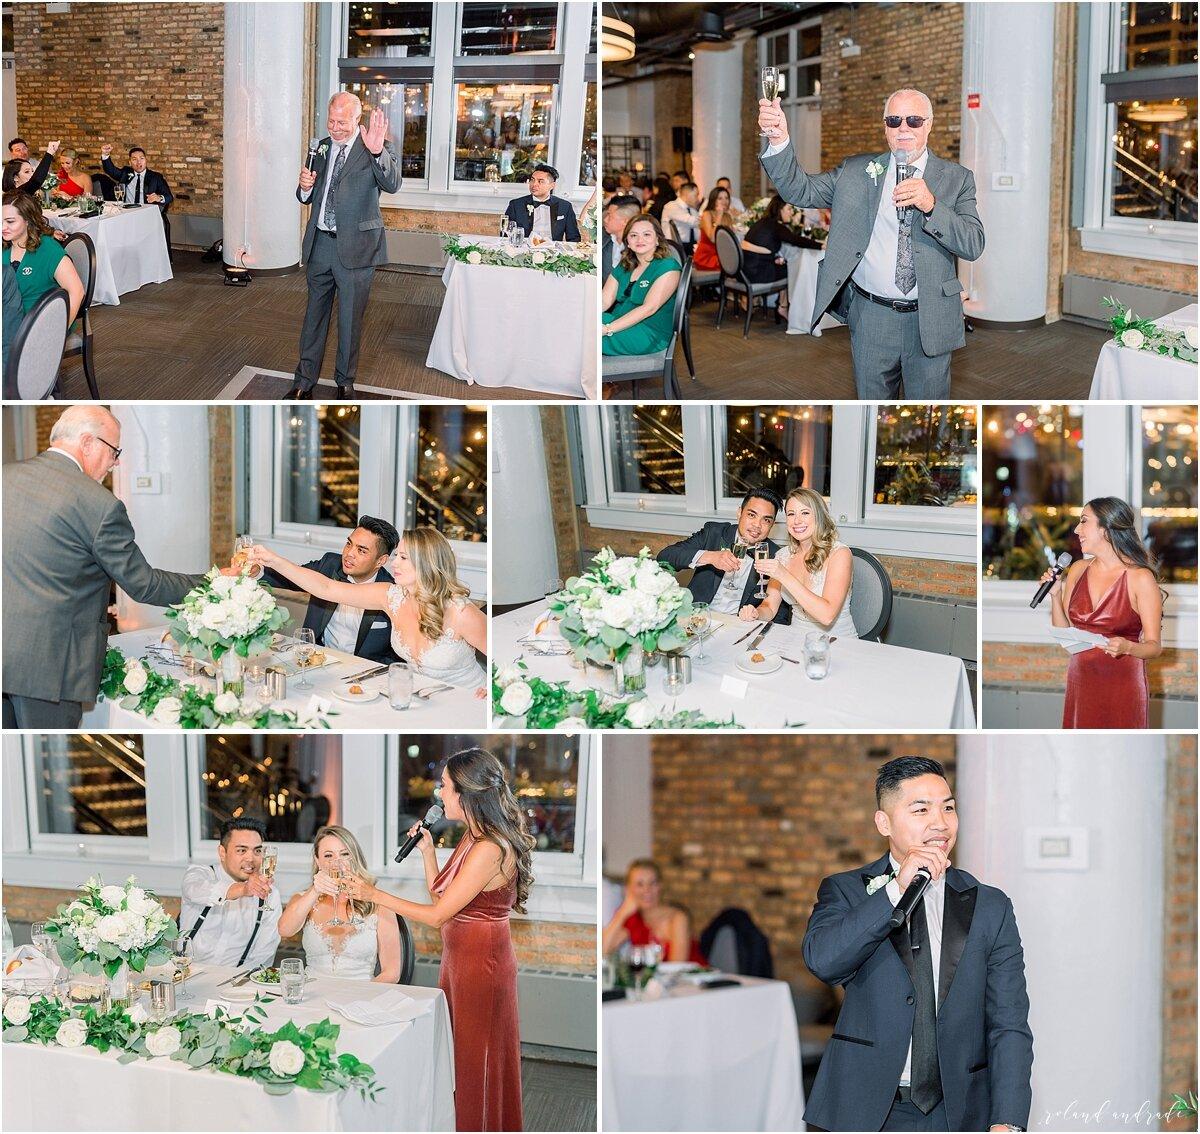 River Roast Wedding + Light and Airy Wedding Photographer Chicago + renaissance Hotel Wedding Photographer + Chicago Photography + Naperville Wedding Photographer + Chicago Engagement Photographer + Best Photographer In Chicago_0070.jpg